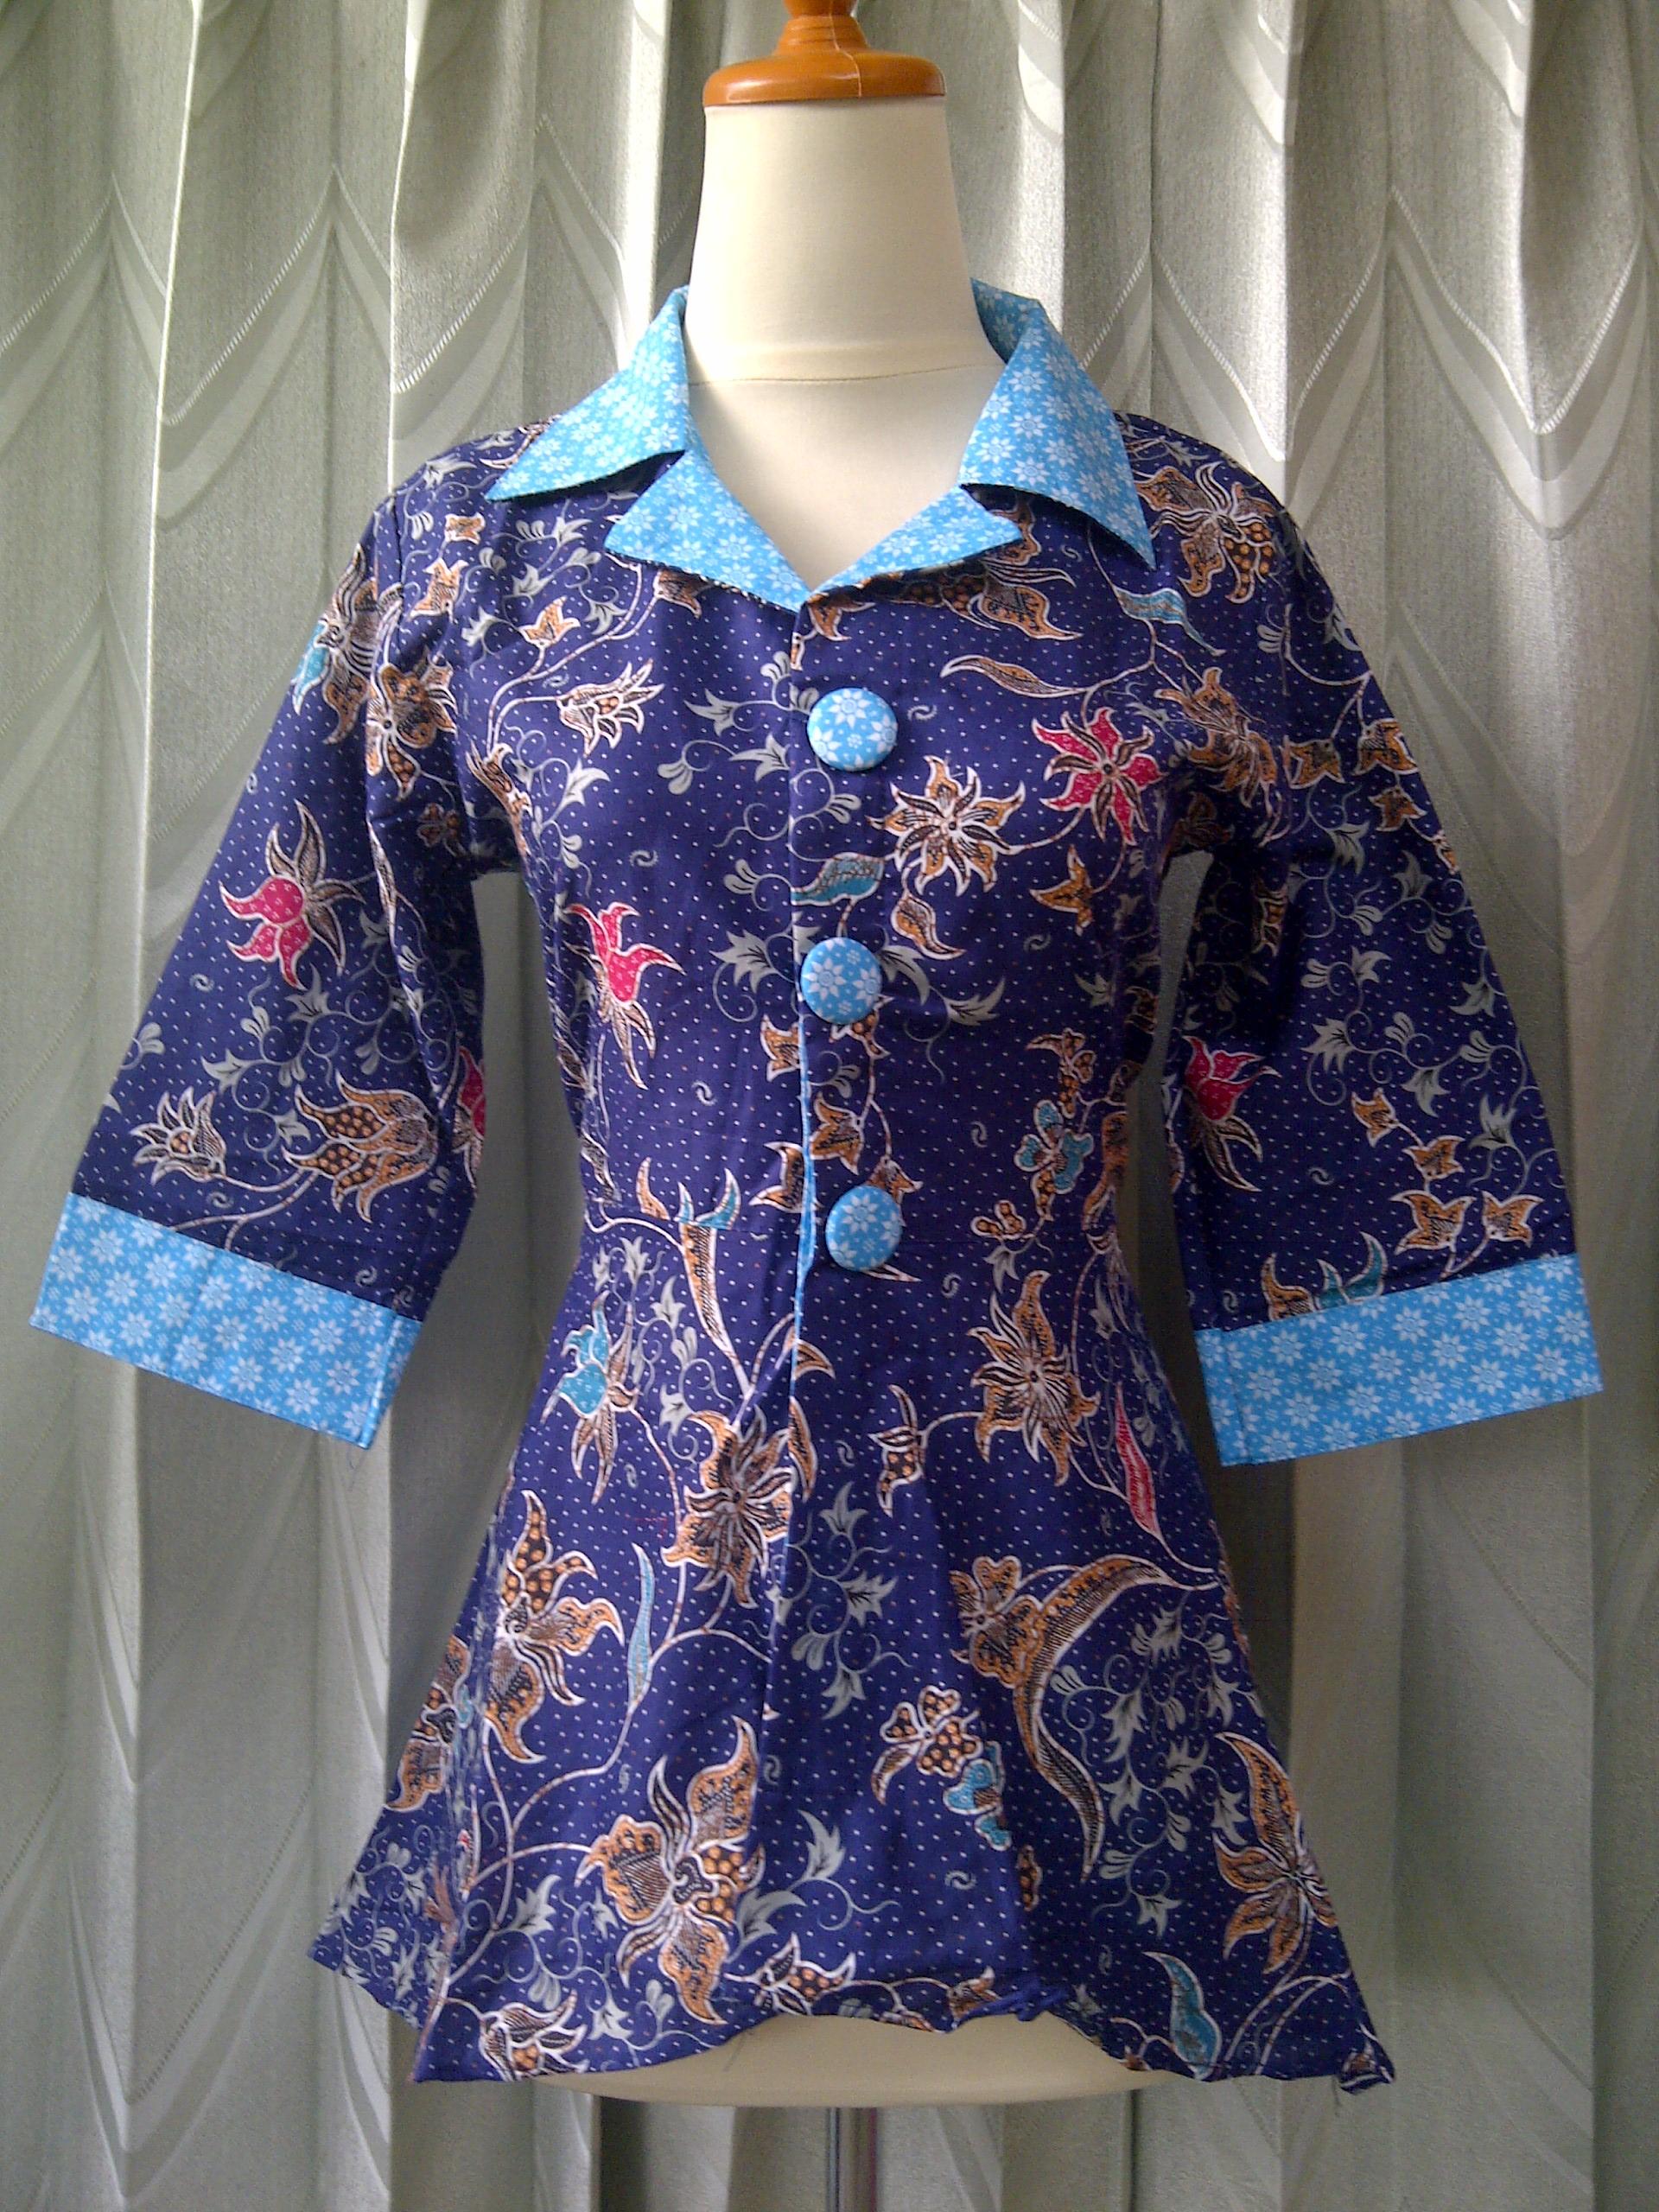 30 Model Gamis Batik Hijau Tosca Fashion Modern dan